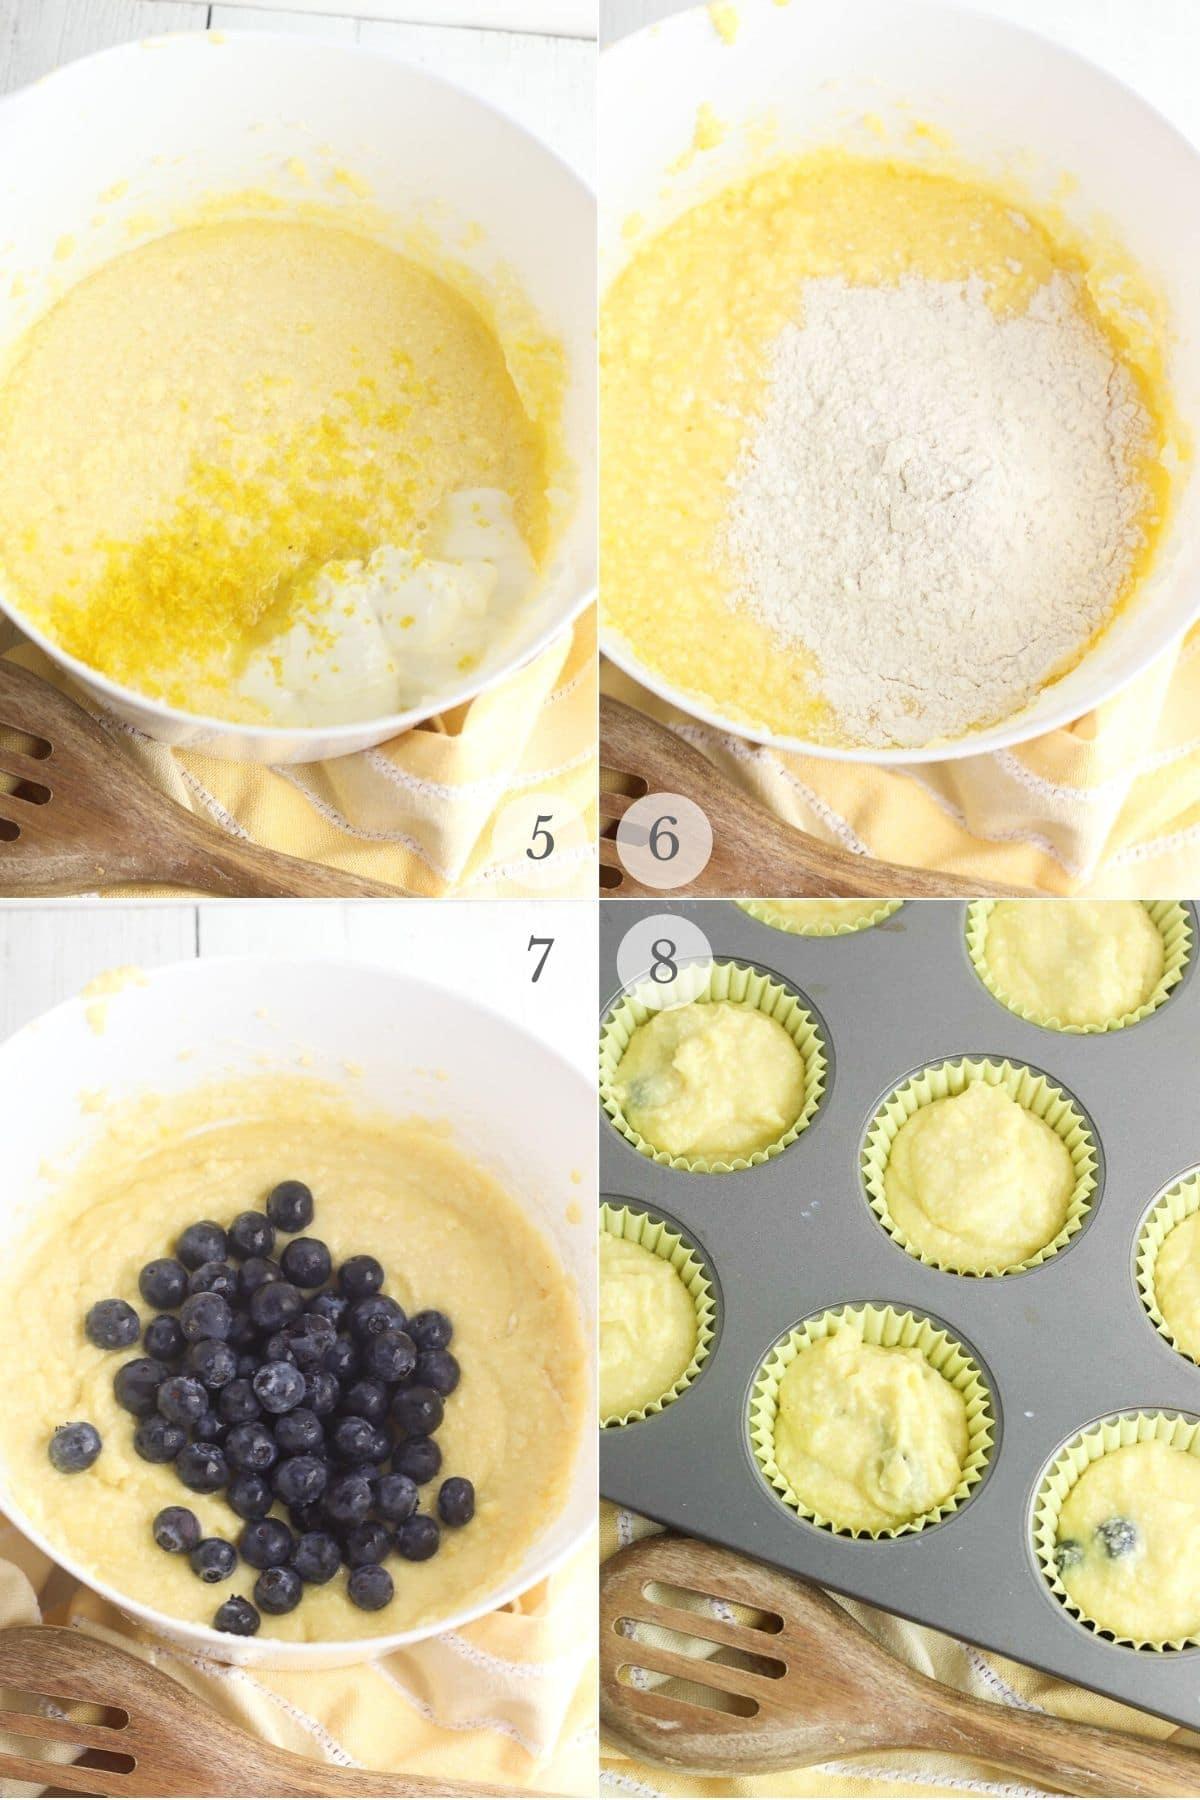 lemon blueberry muffins recipe steps 5-8